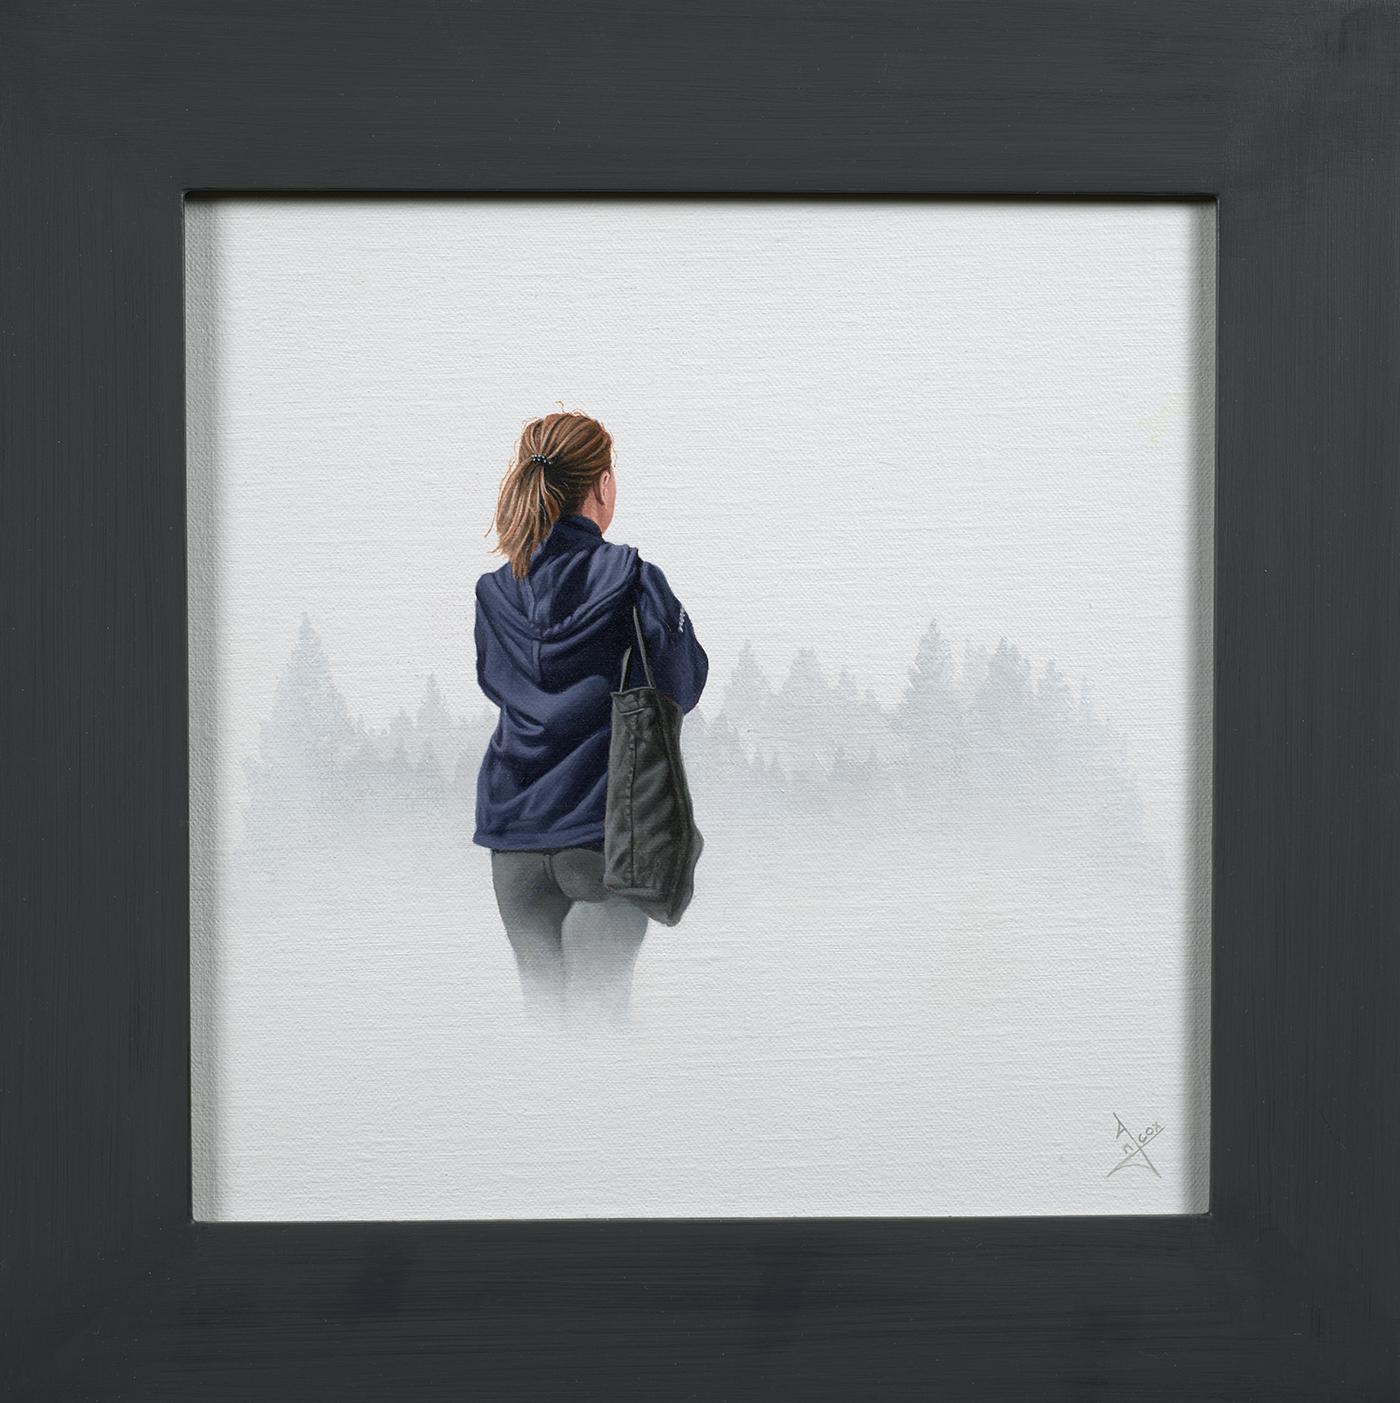 nigel_cox_nc1020_a_forest_ii_framed.jpg